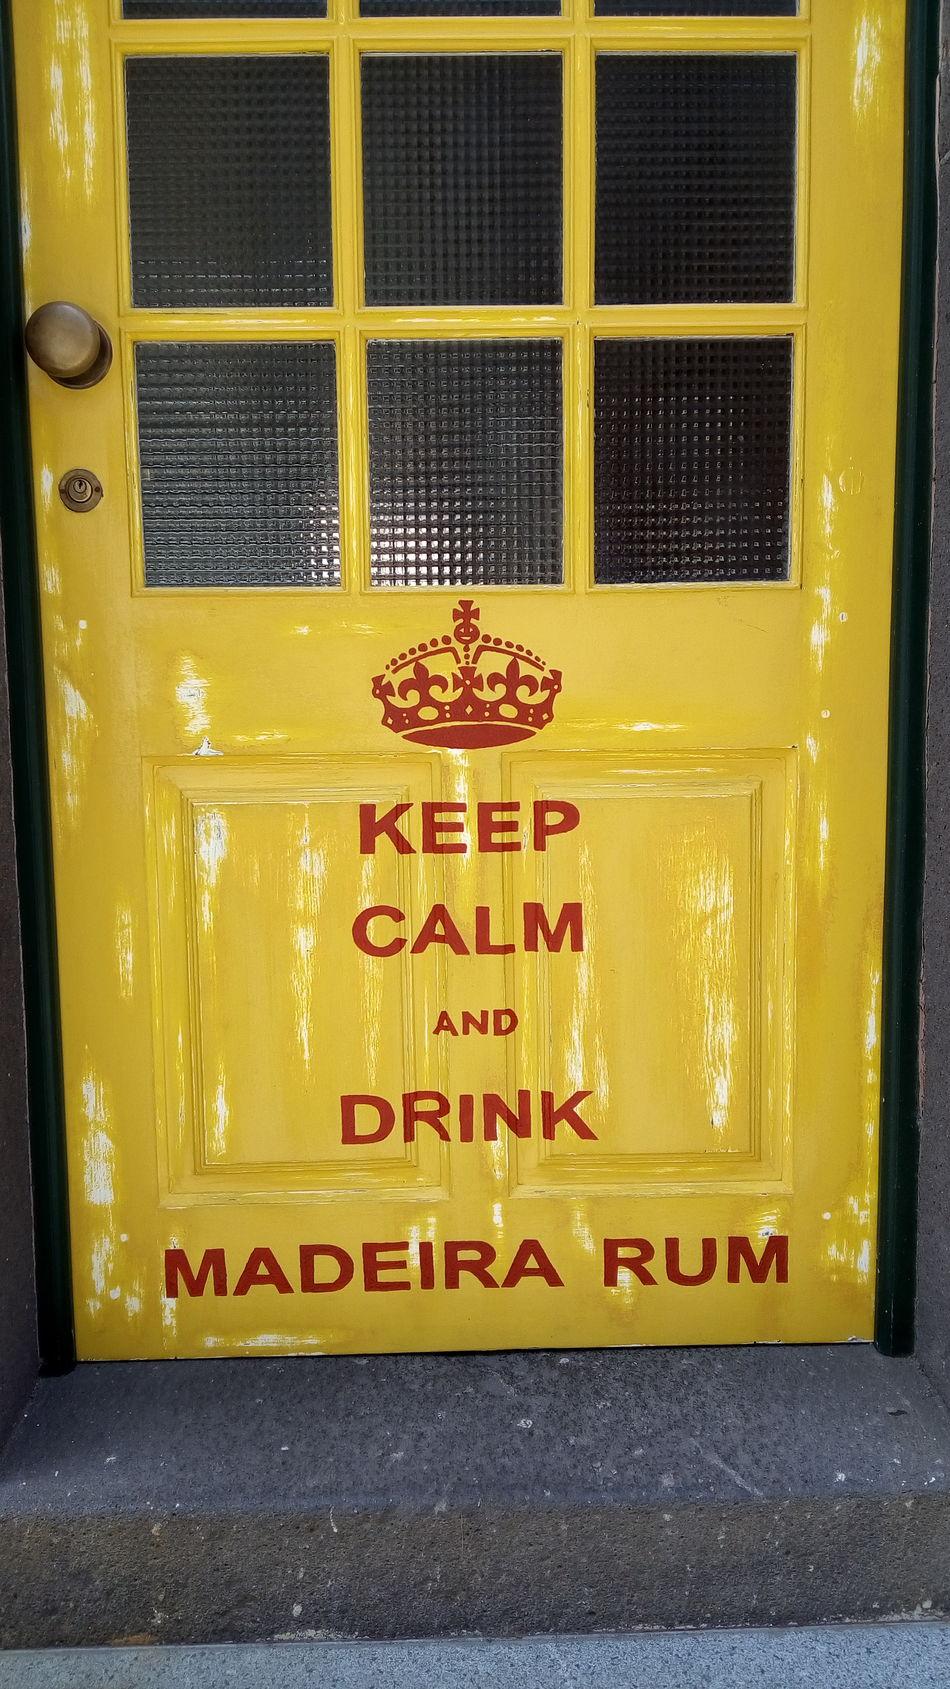 Keep Calm Keep Calm And Drink Madeira Rum Madeira Island Funchal Madeira Creativity